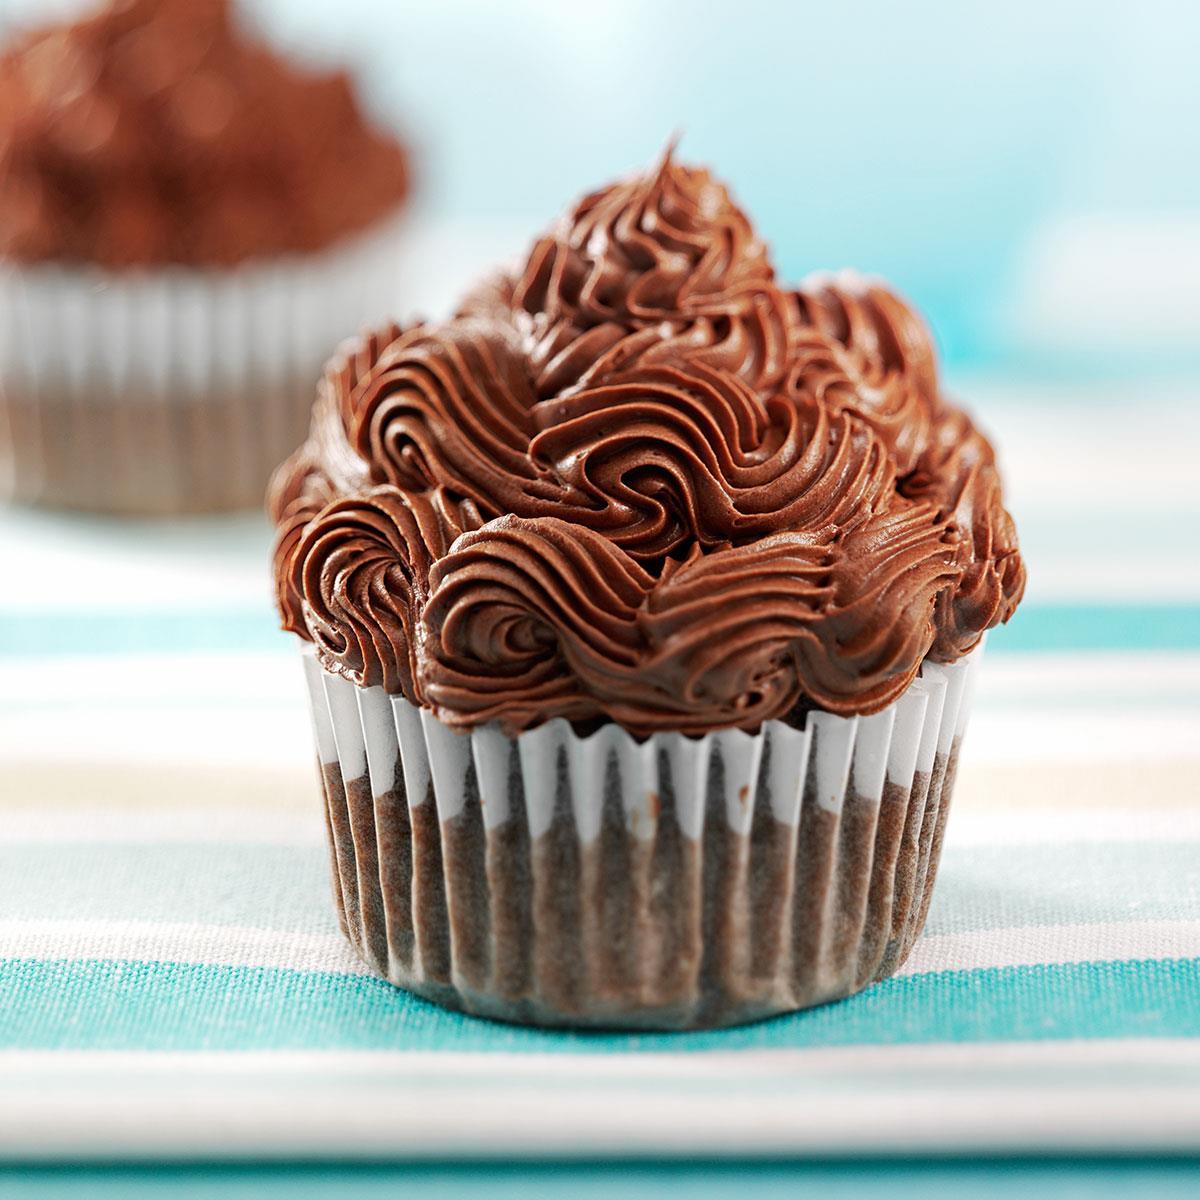 Cocoa Banana Cupcakes Recipe: How to Make It | Taste of Home